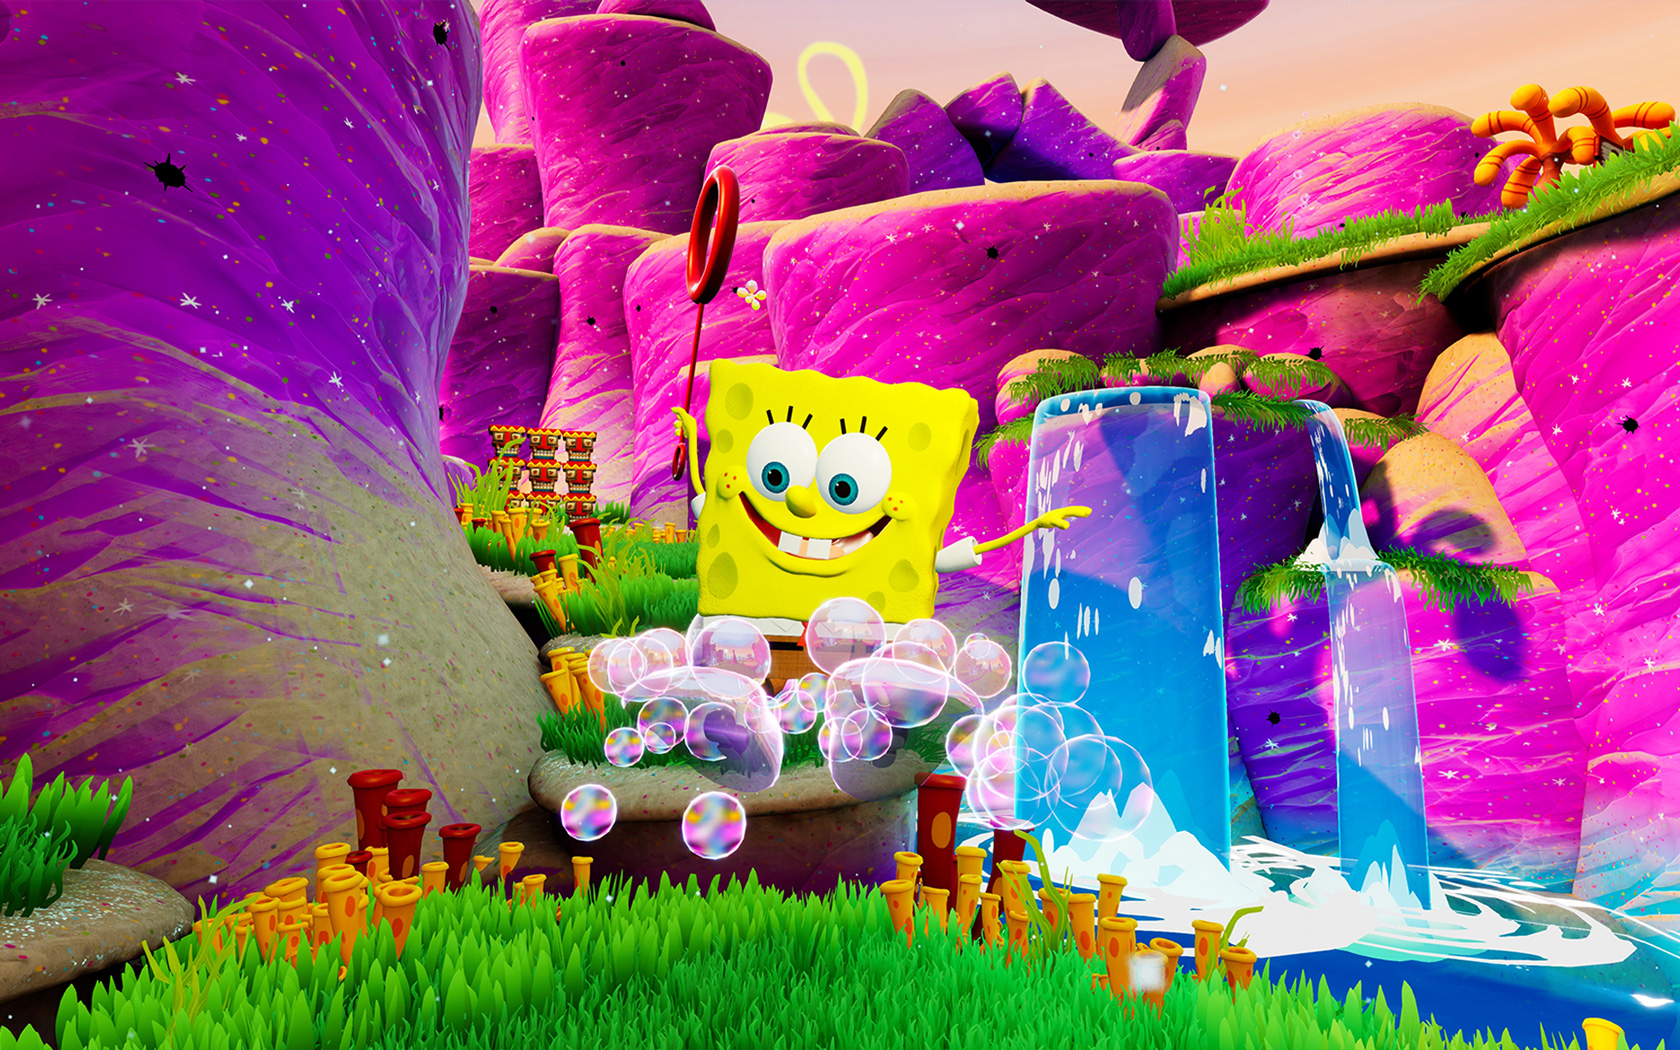 SpongeBob SquarePants: Battle for Bikini Bottom Wallpaper in 1680x1050